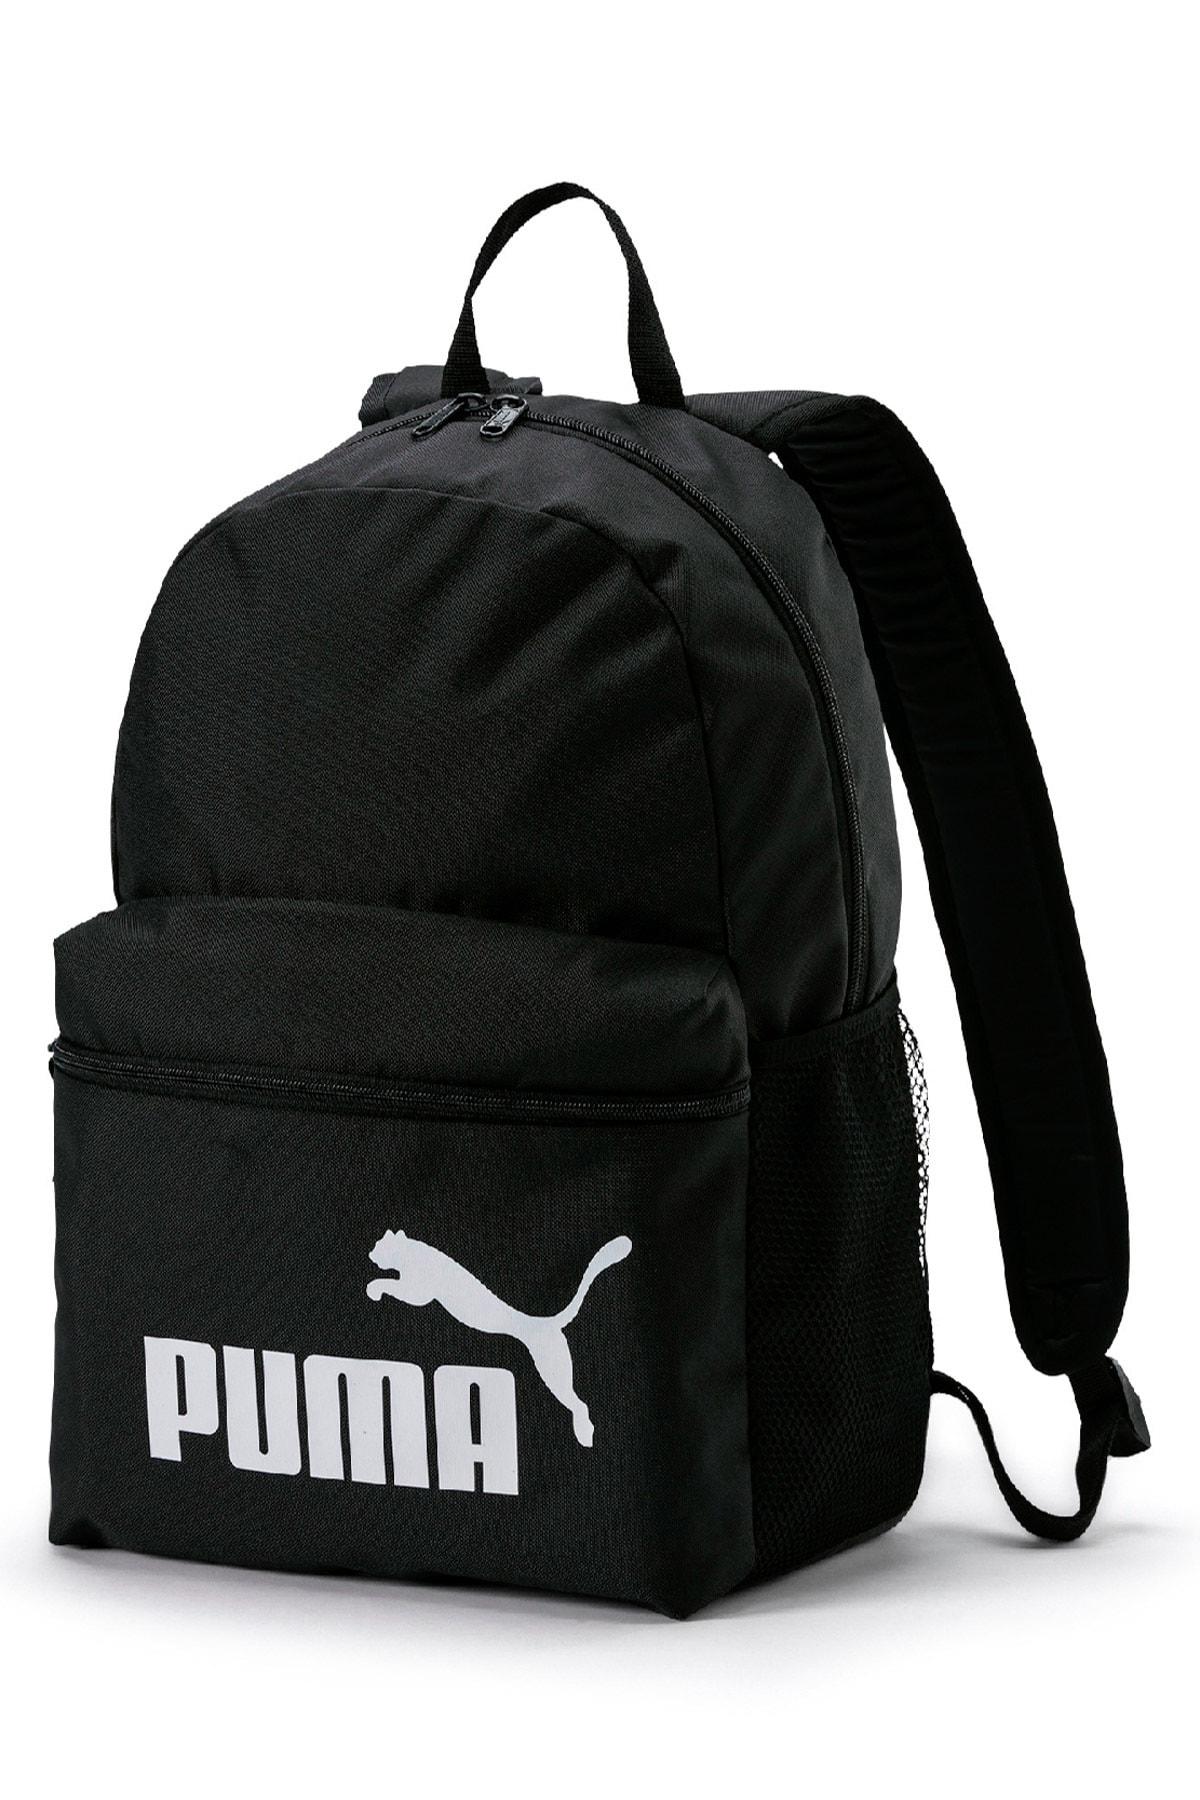 Puma Phase Sırt Çantası - 07548701 1